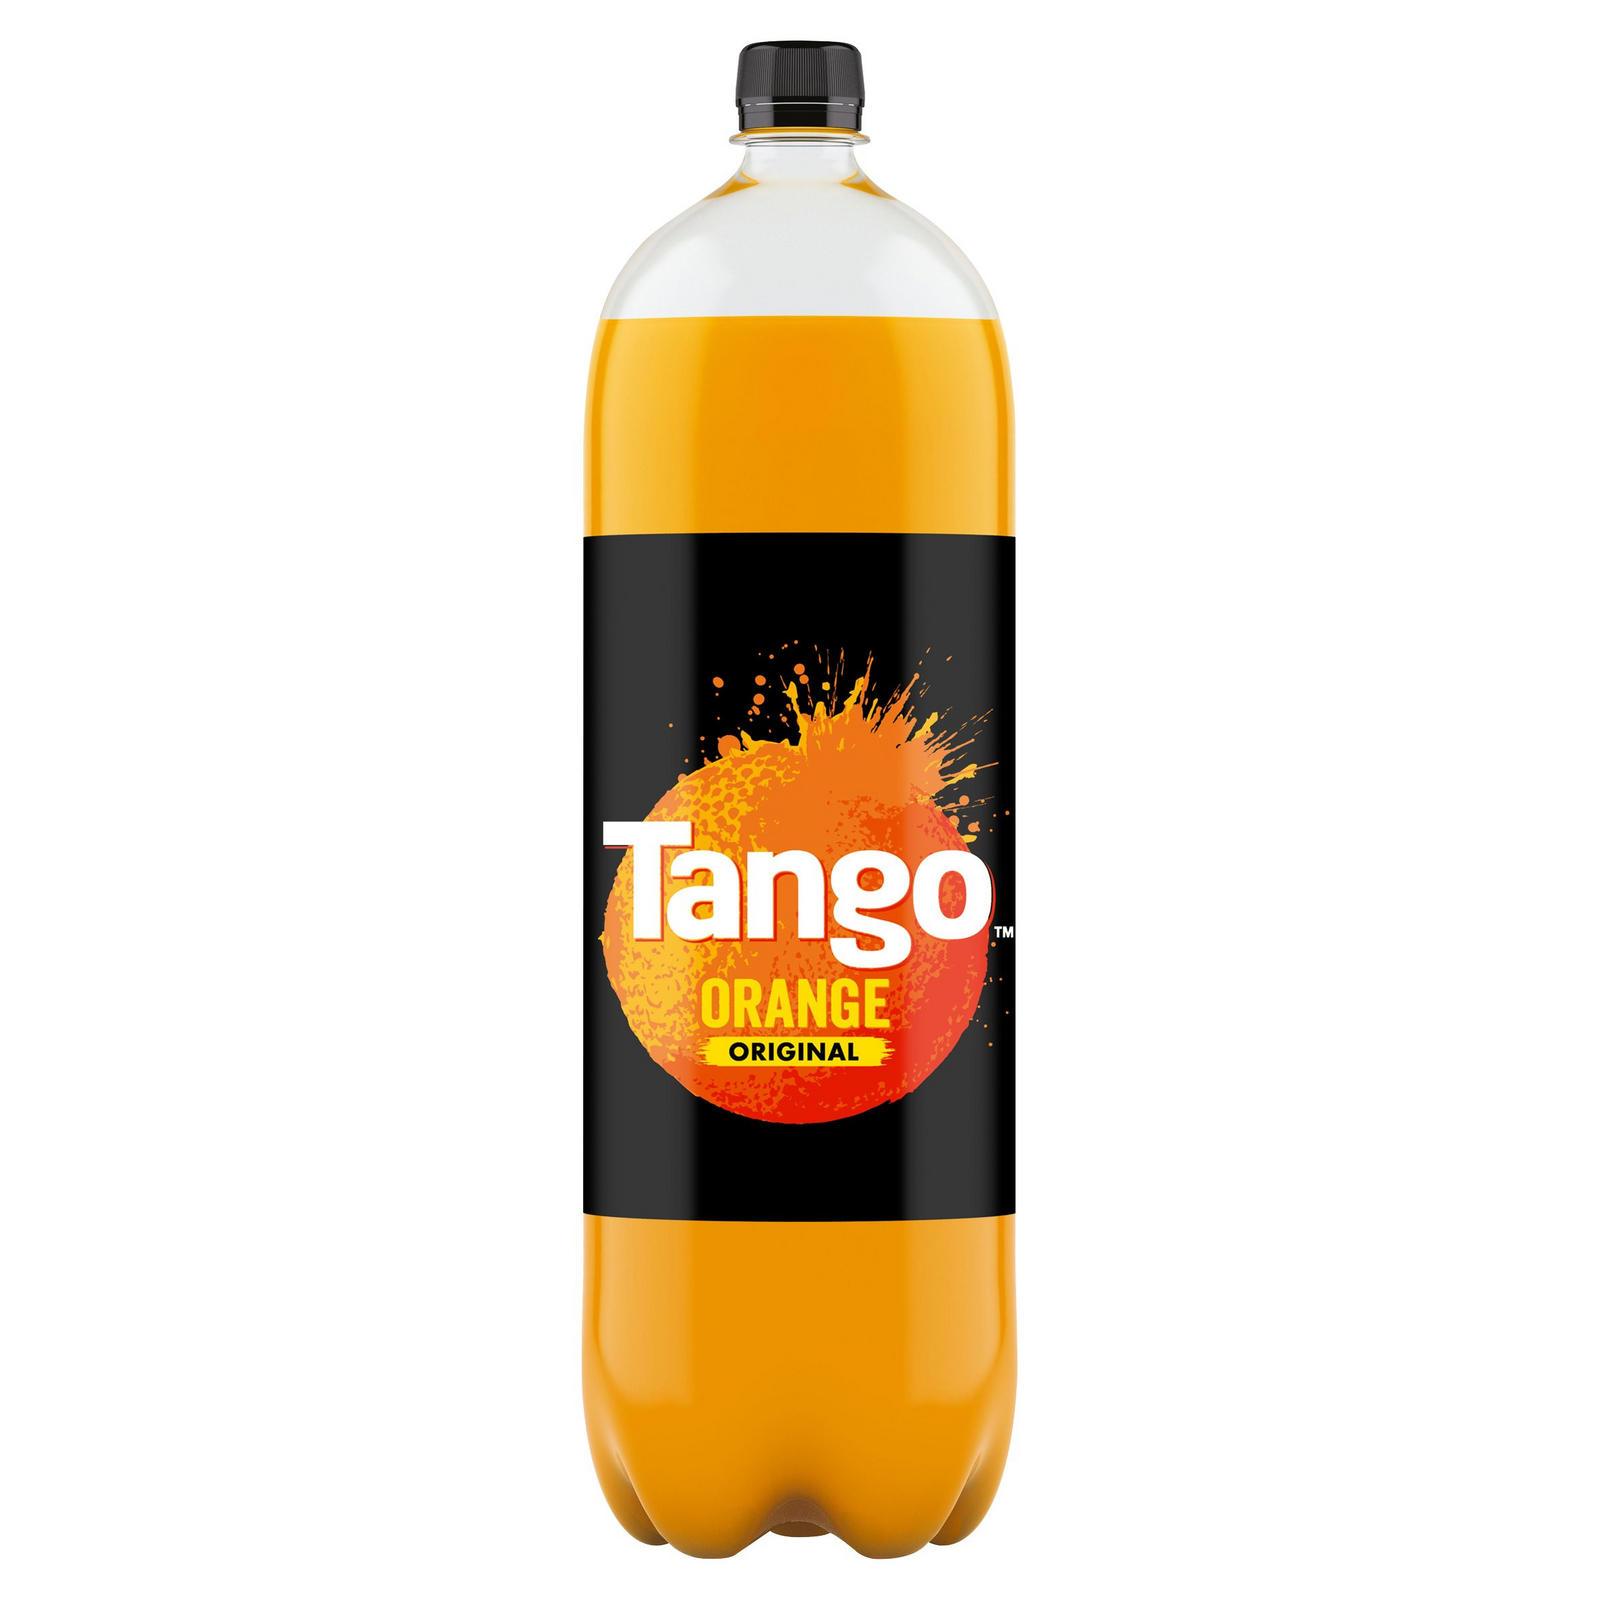 Tango Orange 2L | Orange and Fruit Flavoured | Iceland Foods